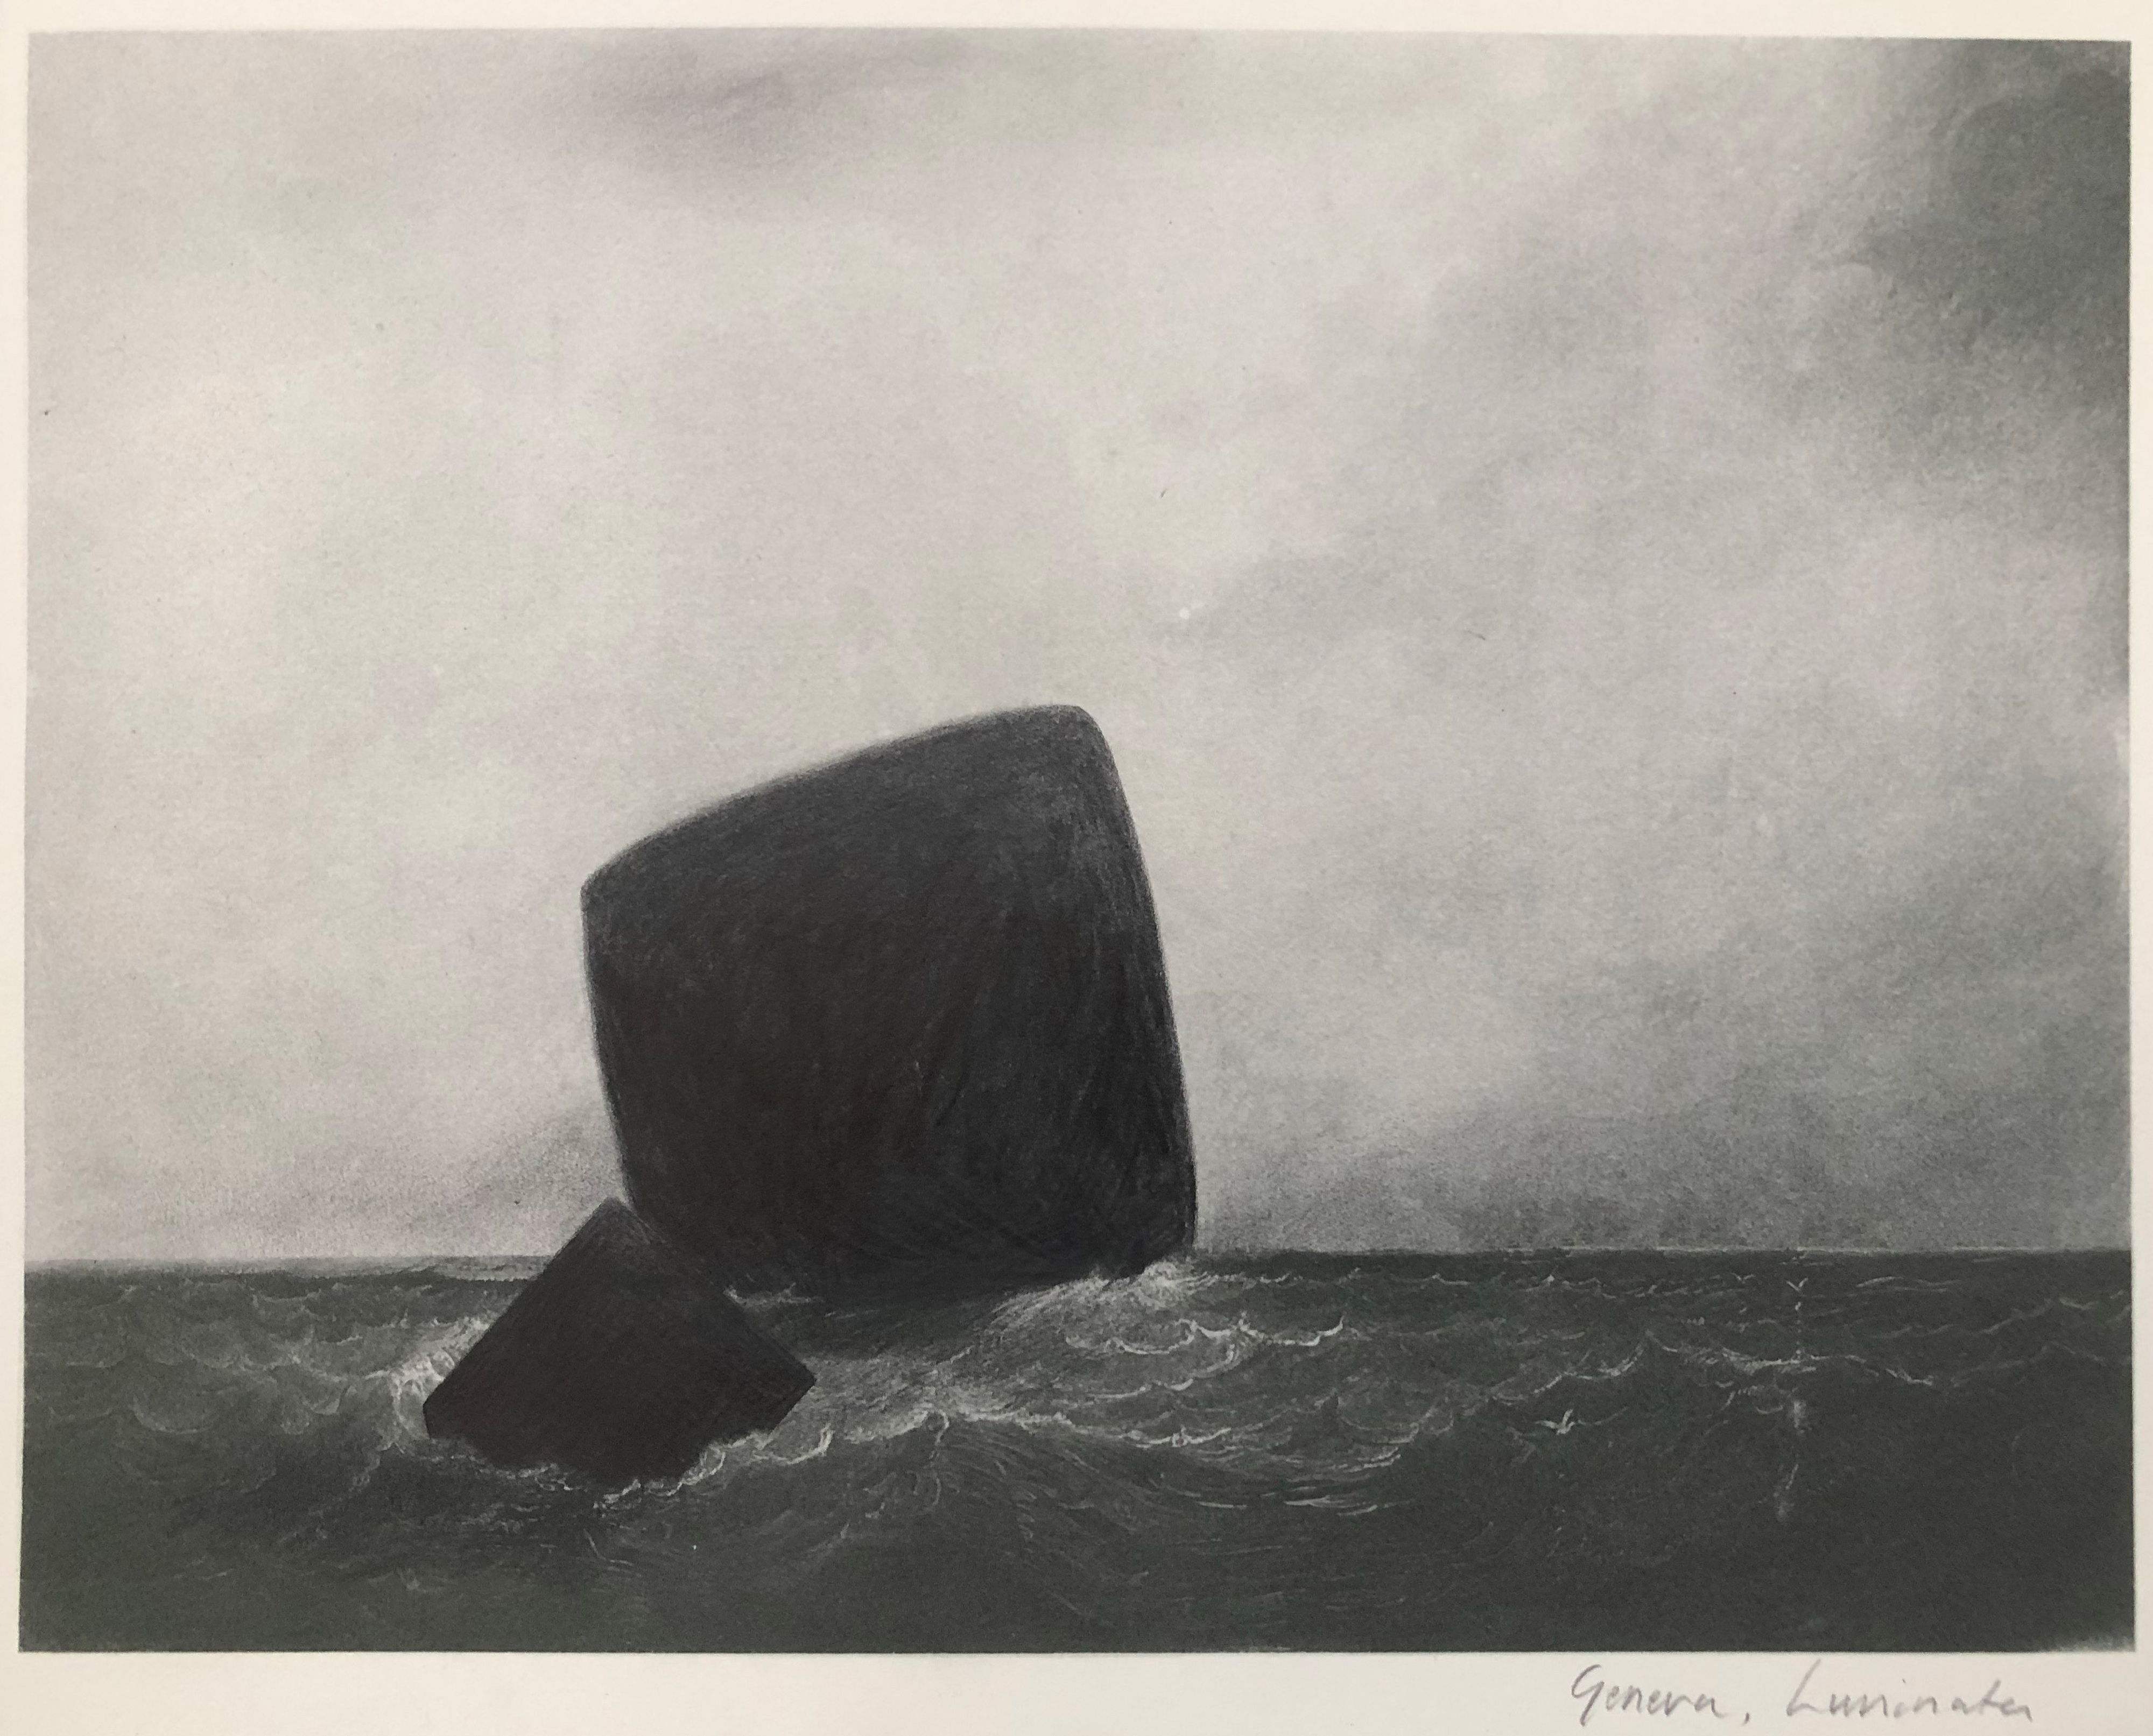 Galerie Barbara Thumm \ New Viewings #6 \ New Viewings #6